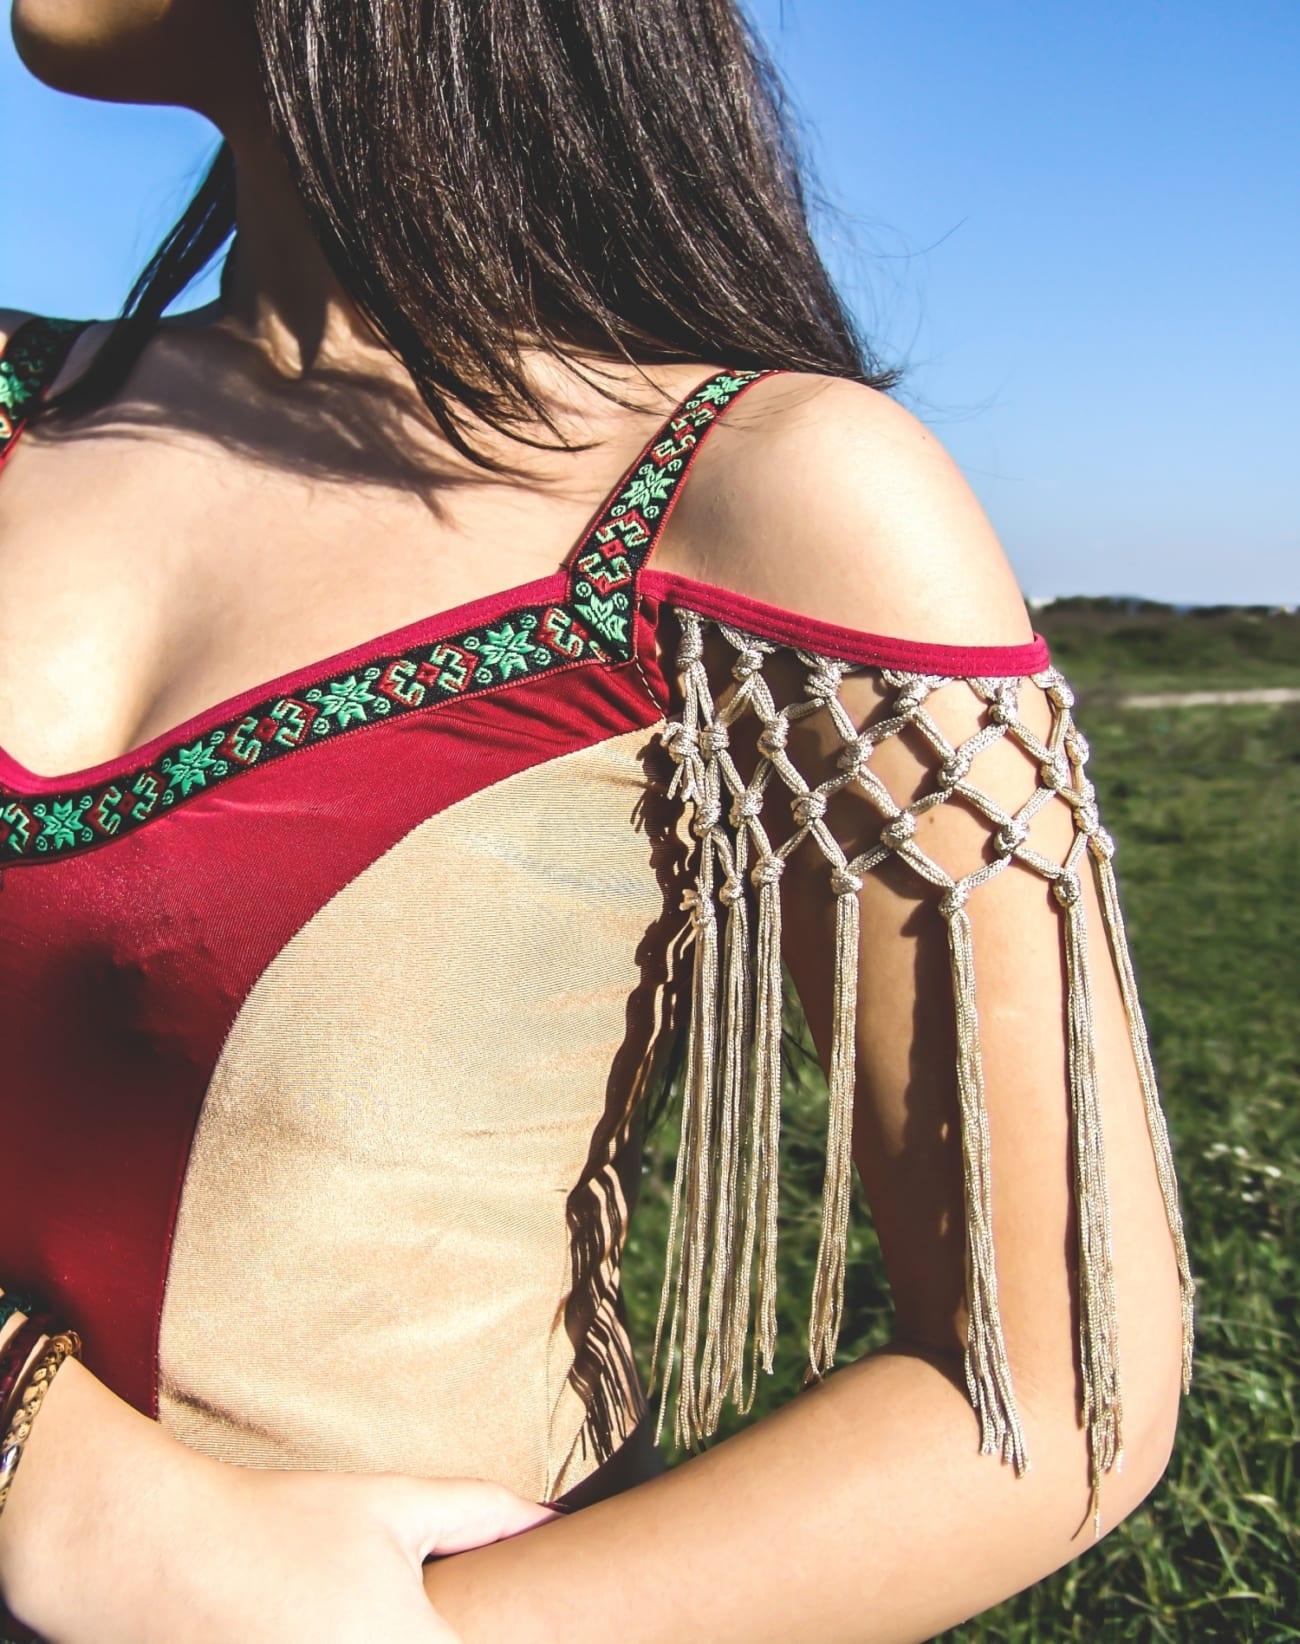 roxi rose fashion blog romania halloween indian native costume wildfashion (6)